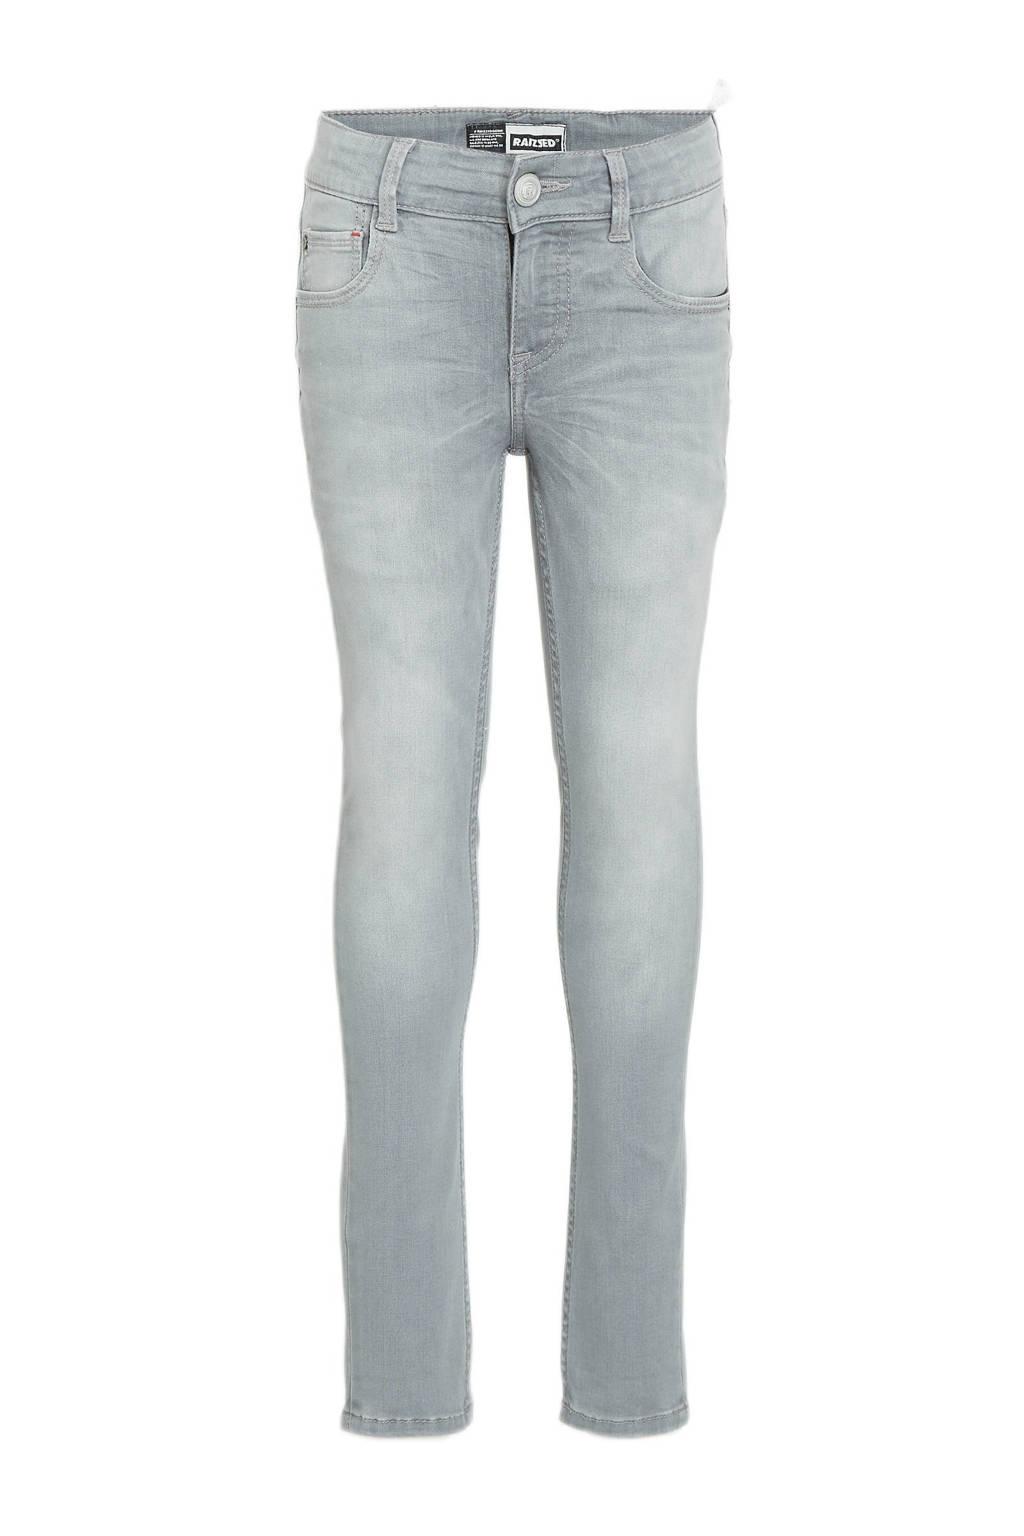 Raizzed skinny jeans Tokyo light grey stoned, Light grey stoned